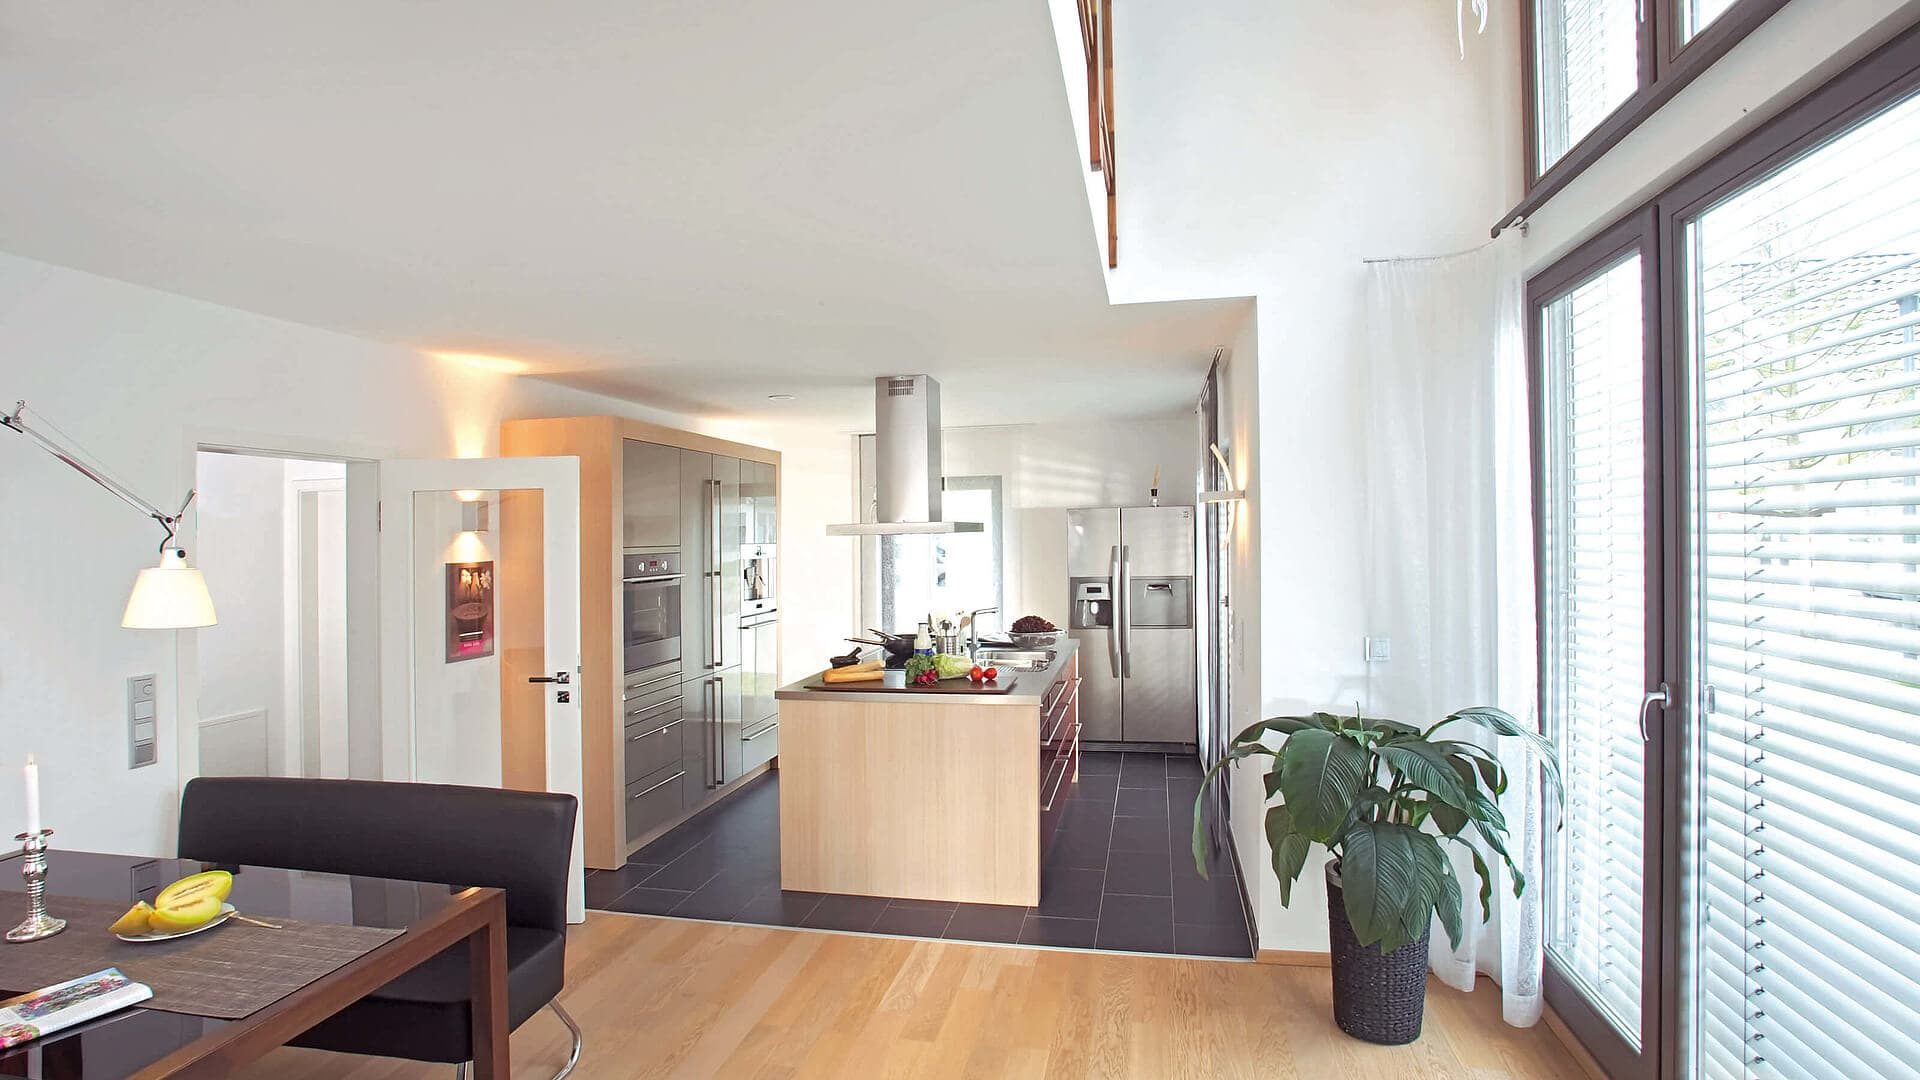 fingerhut musterhaus r in erlangen. Black Bedroom Furniture Sets. Home Design Ideas